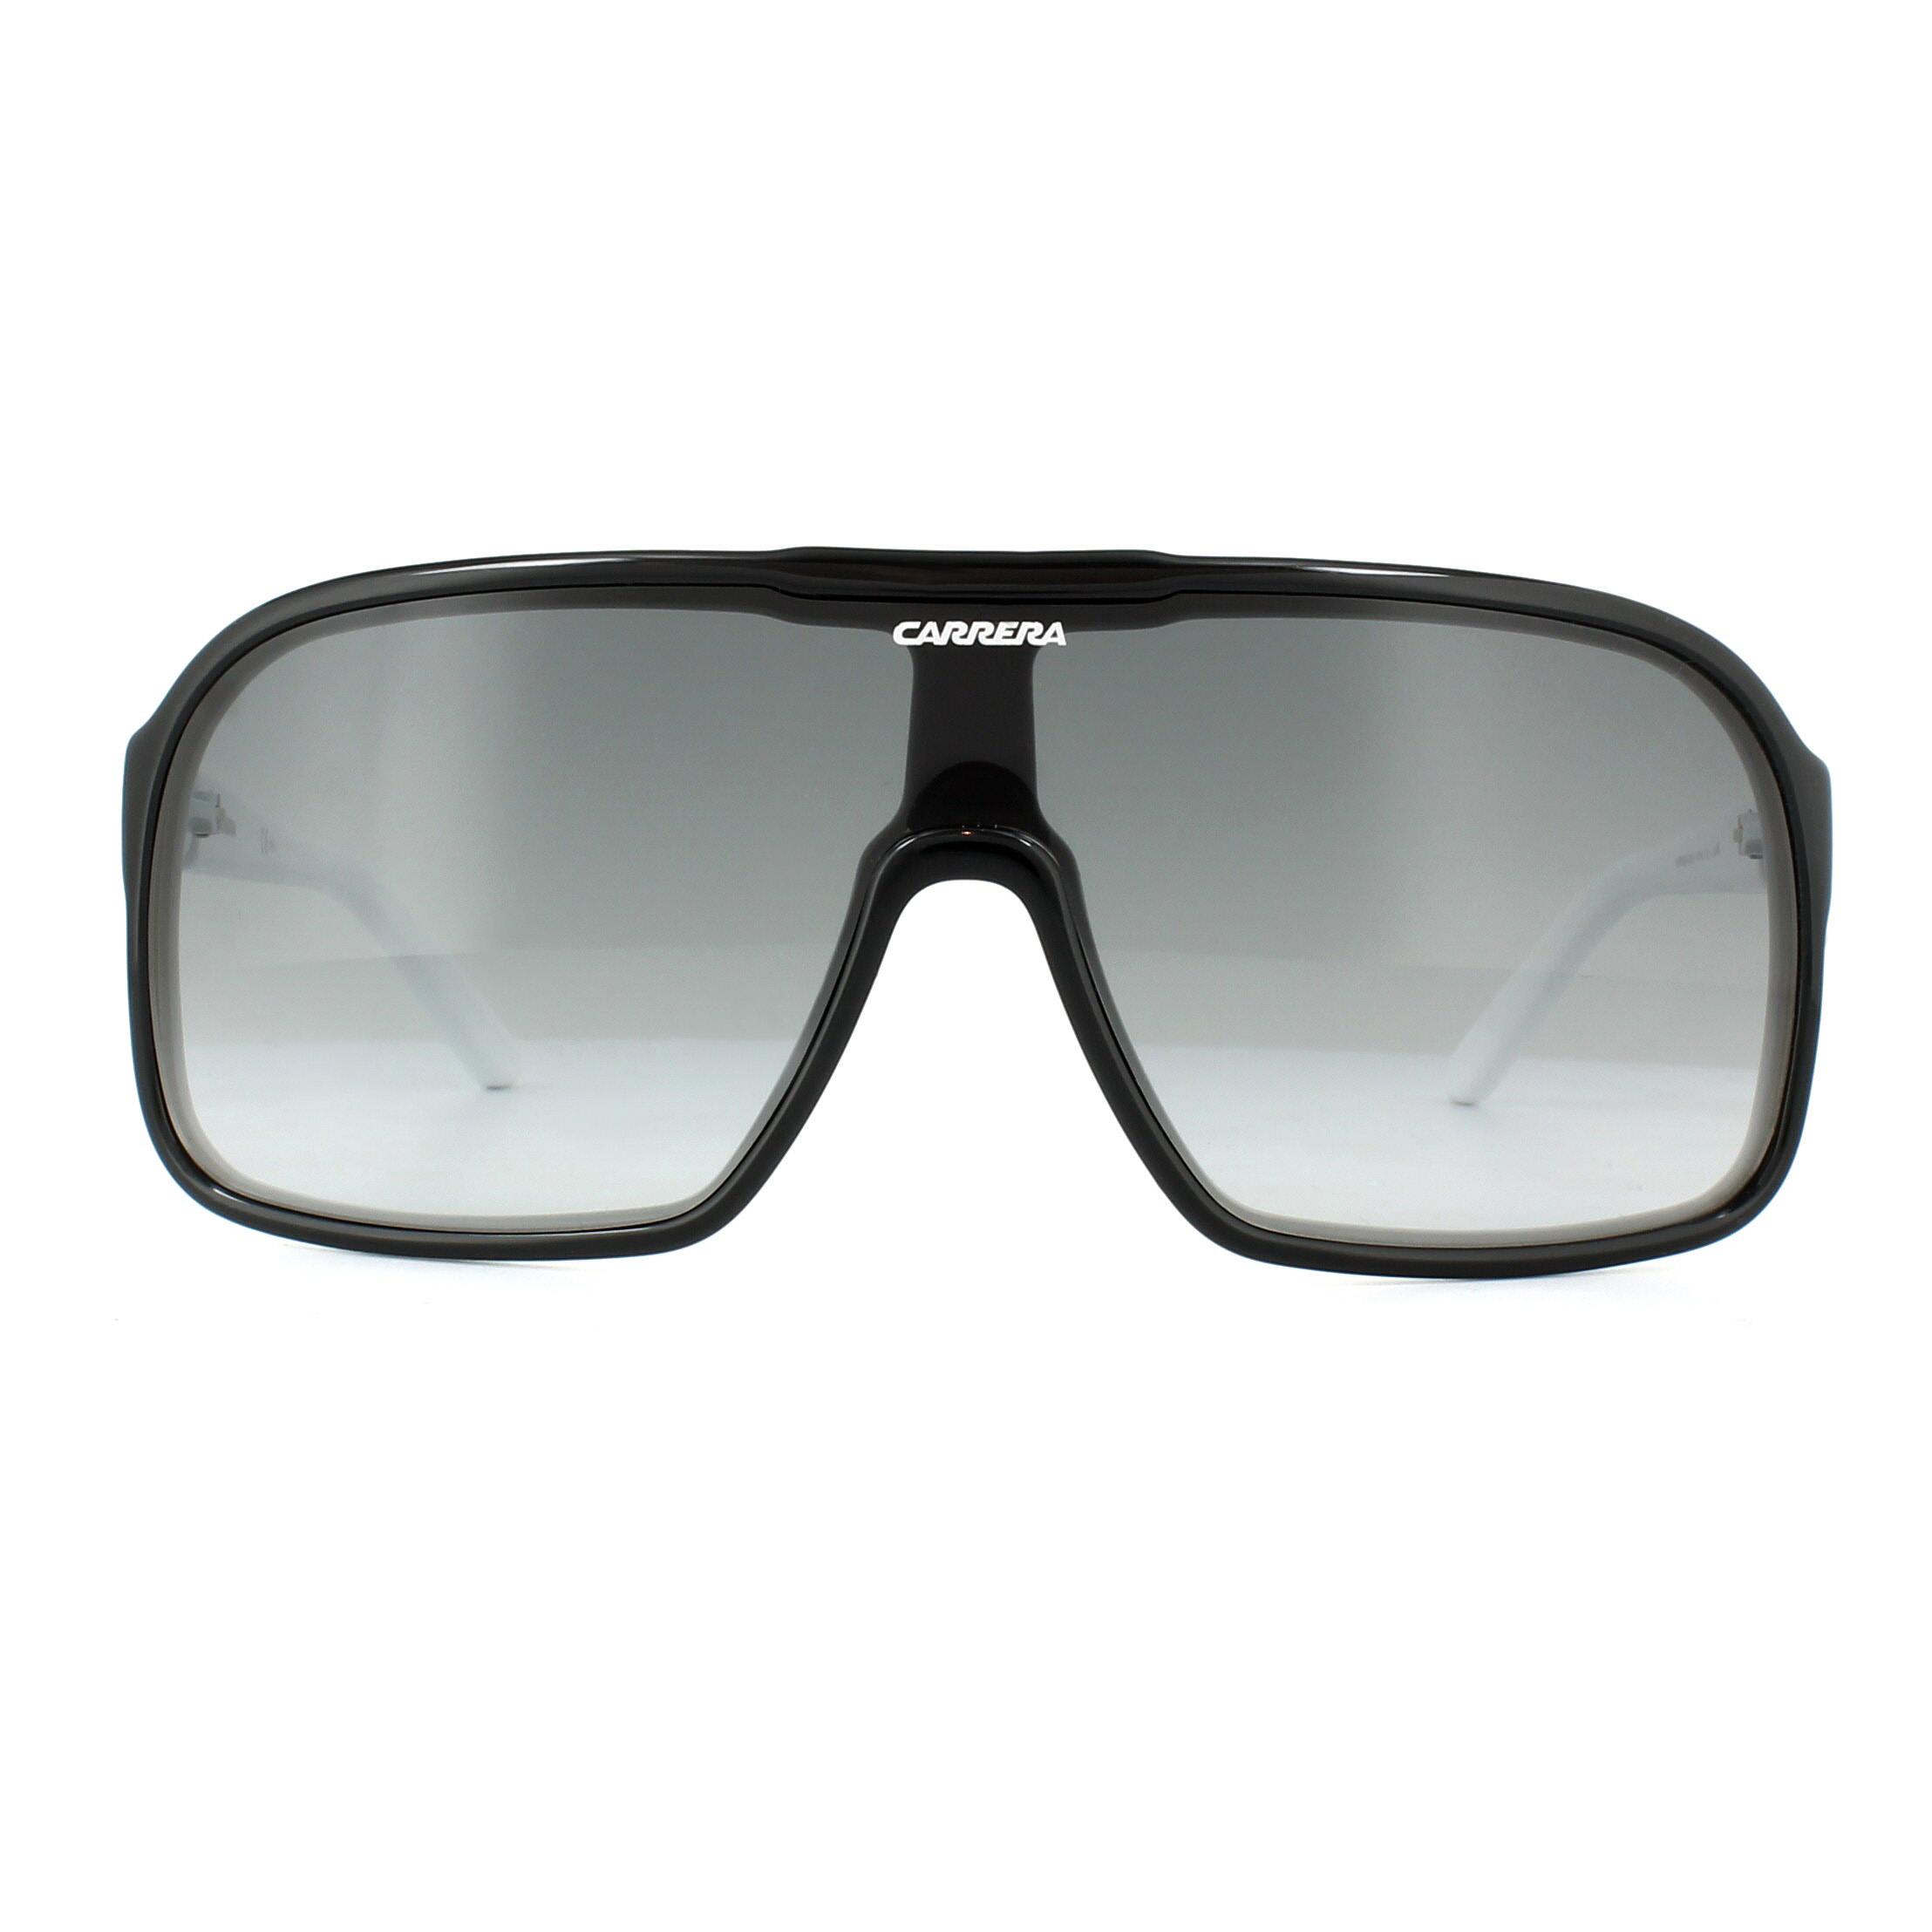 1cb3bbfe600 Cheap Carrera 5530 S Sunglasses - Discounted Sunglasses